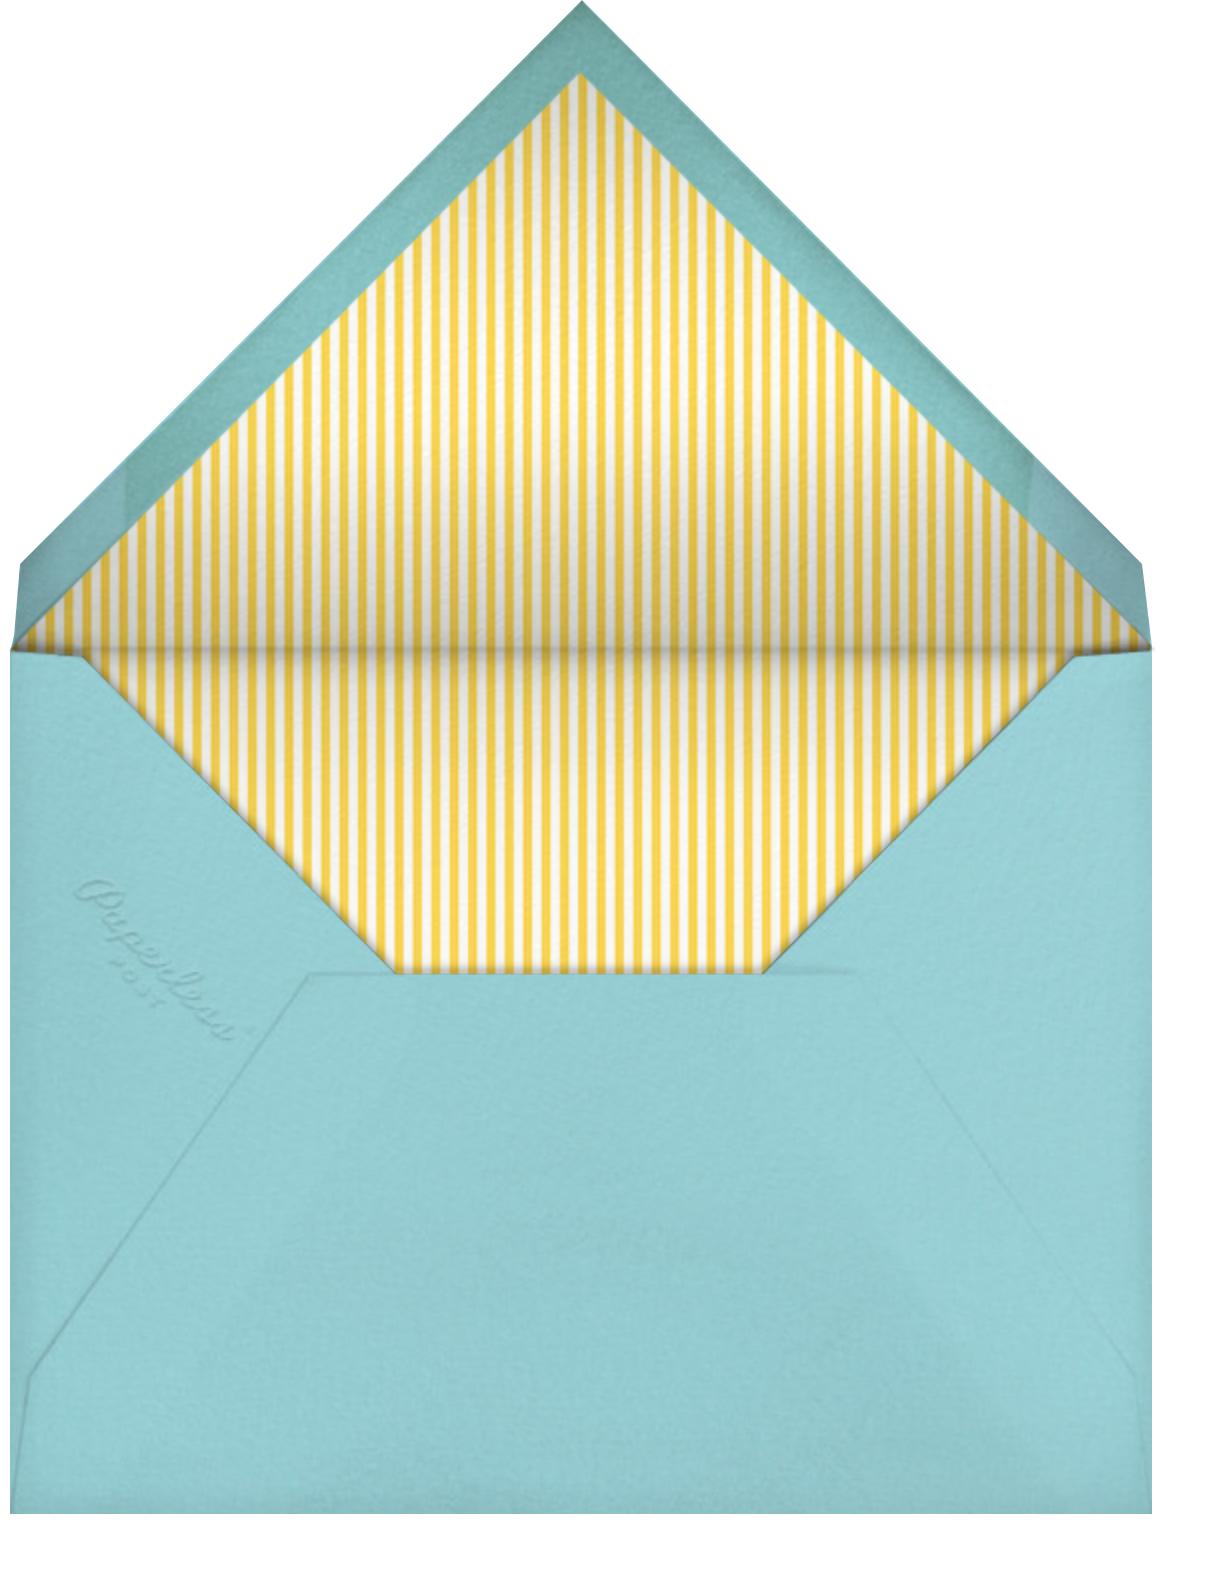 Jungle Birthday Bash (Invitation) - Little Cube - Kids' birthday - envelope back